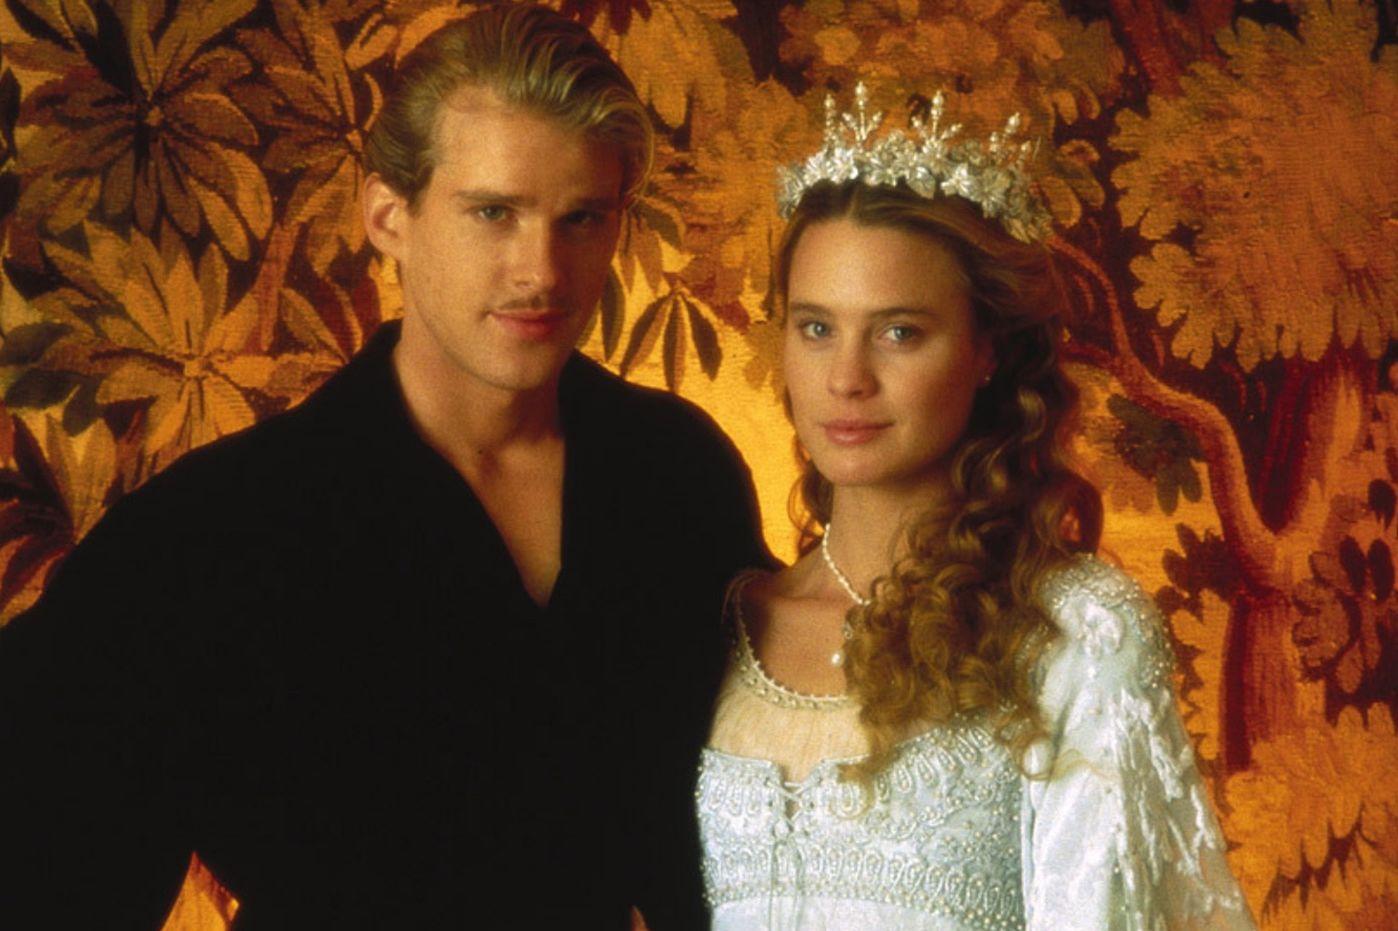 15 Inconceivable Facts About The Princess Bride | Mental Floss